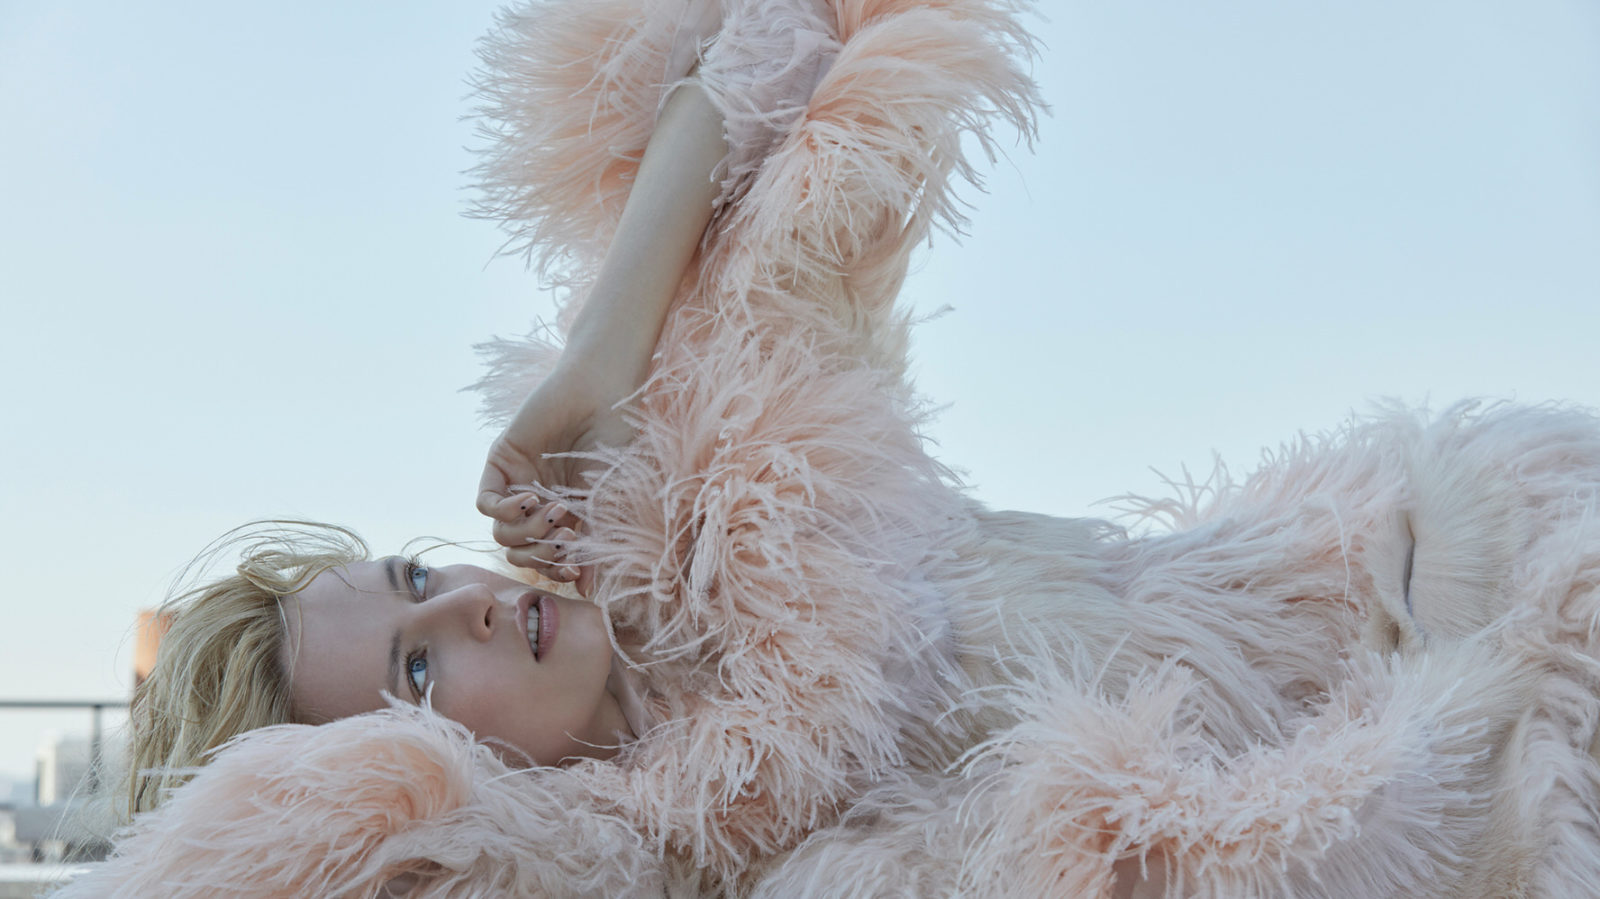 achat d'art - production - eyesee - Daria Strokous